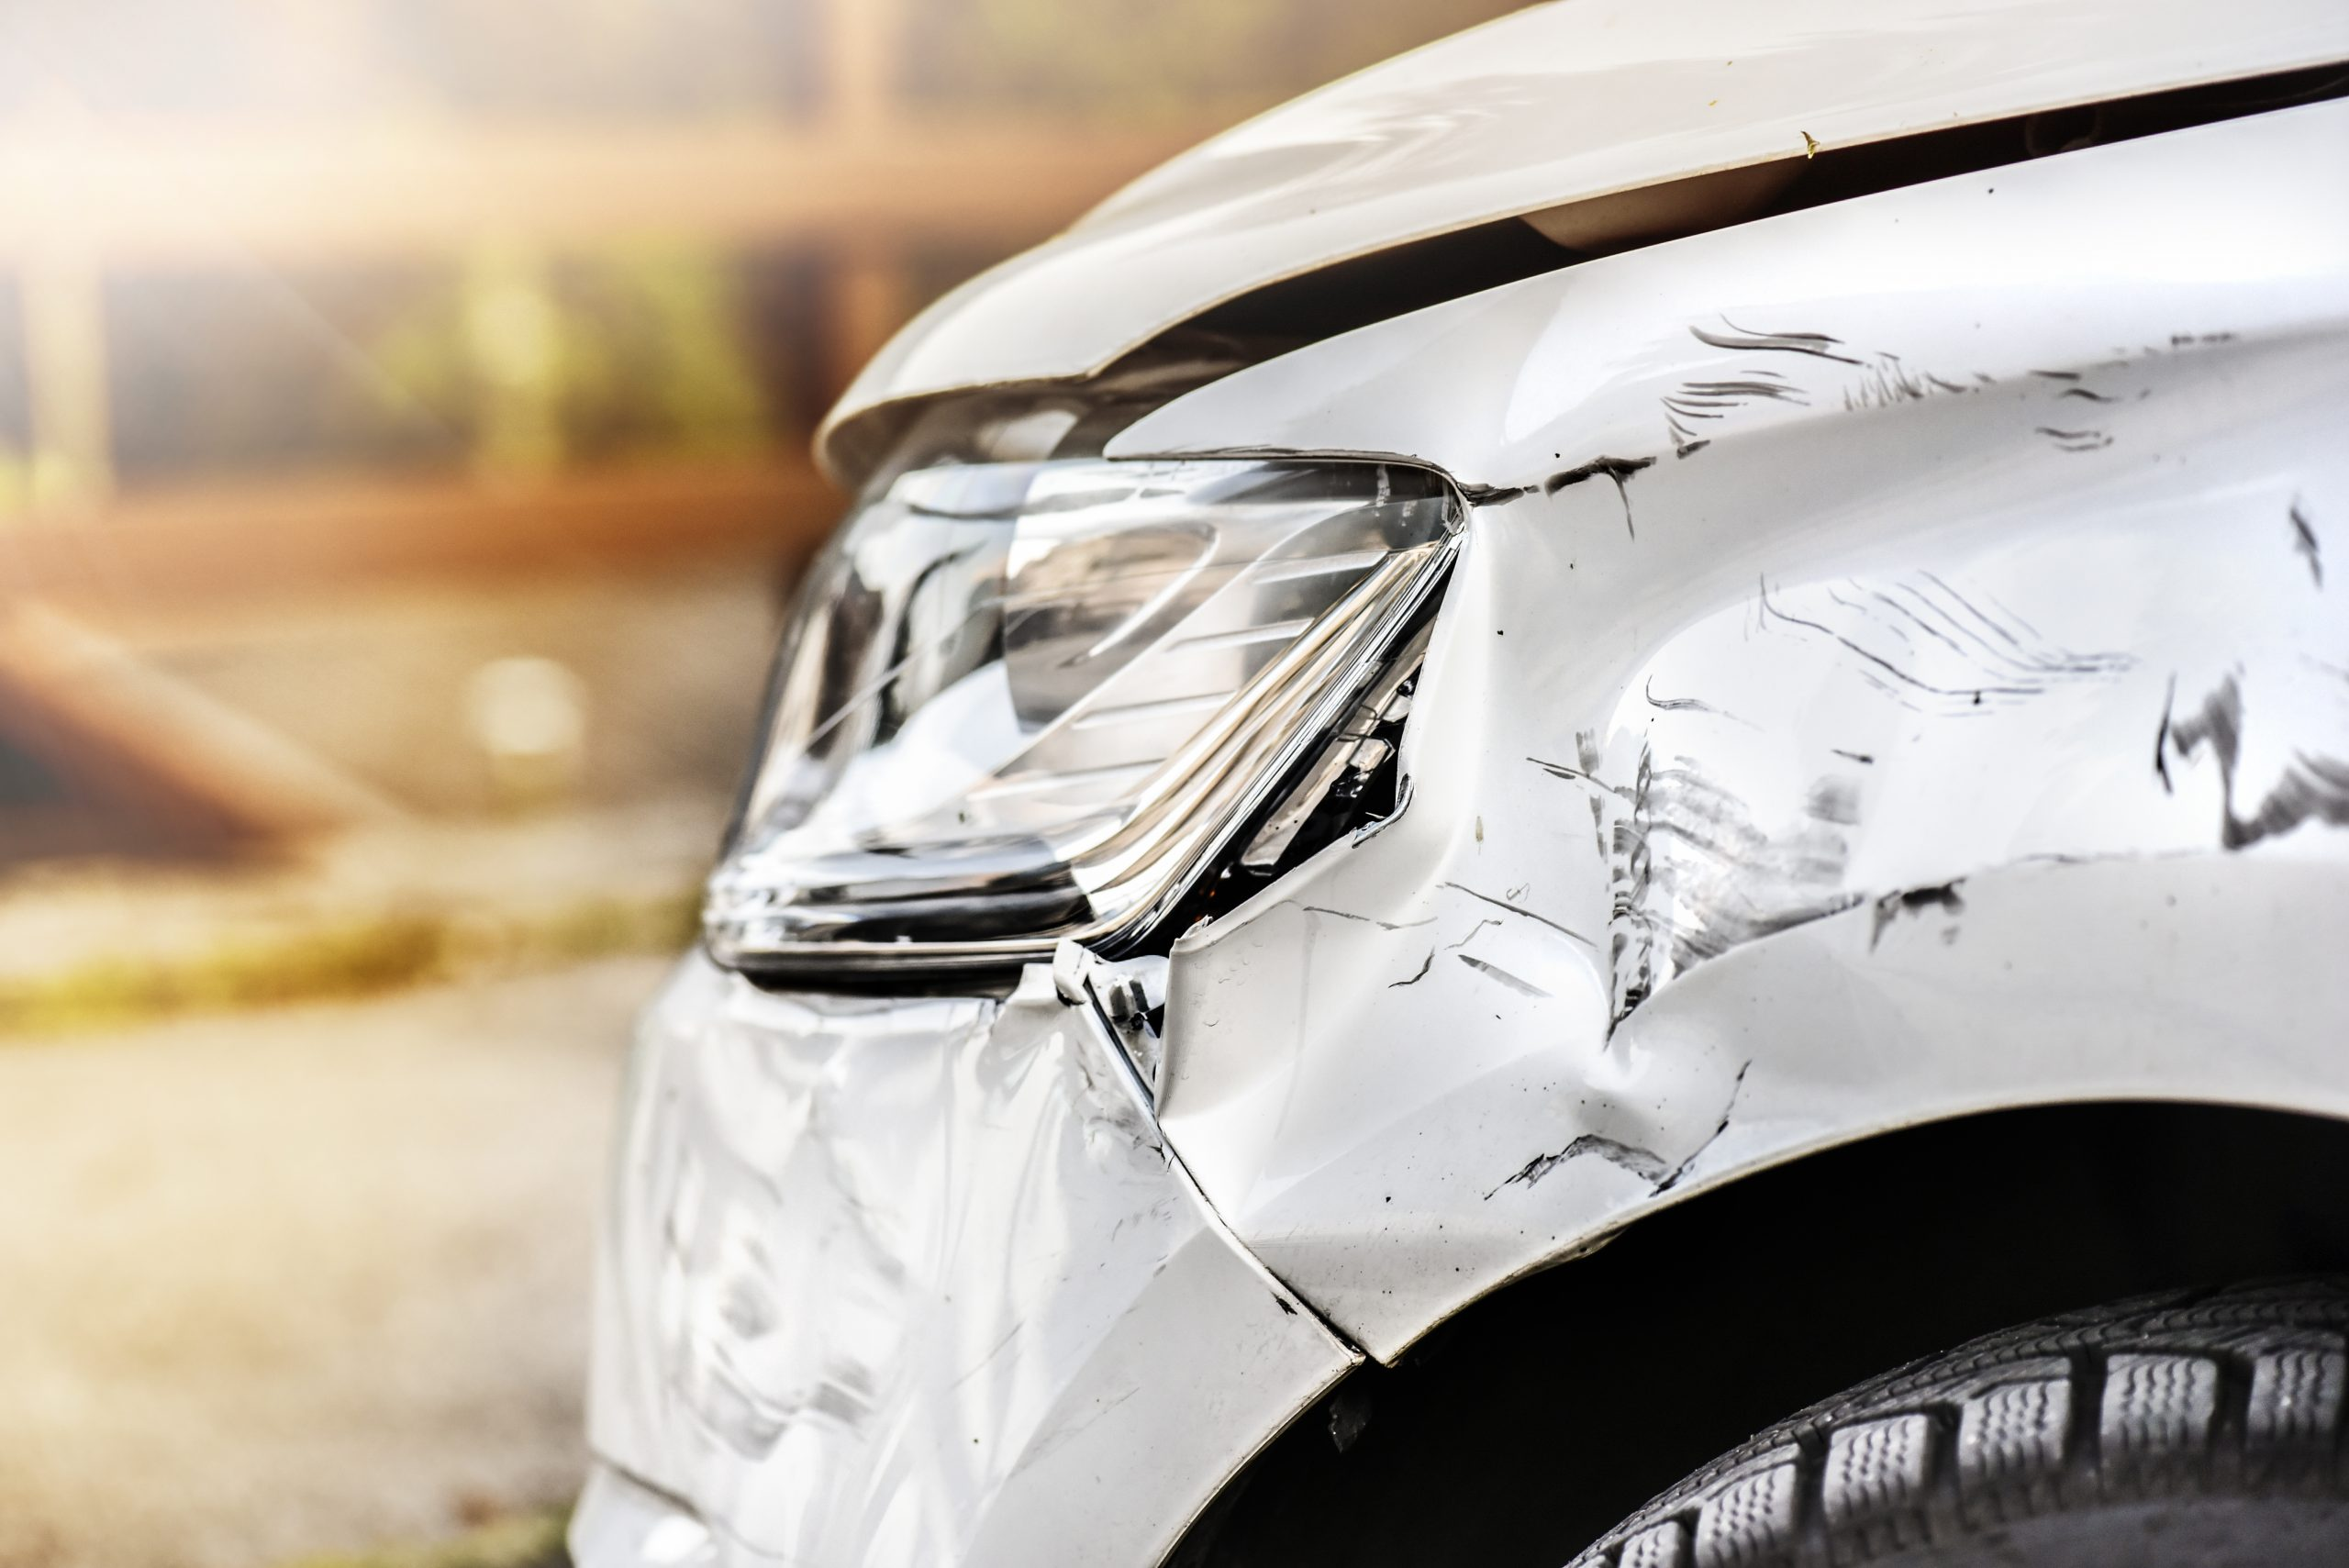 Smart-Repair, Schadenanalyse, Schadenmanagmet